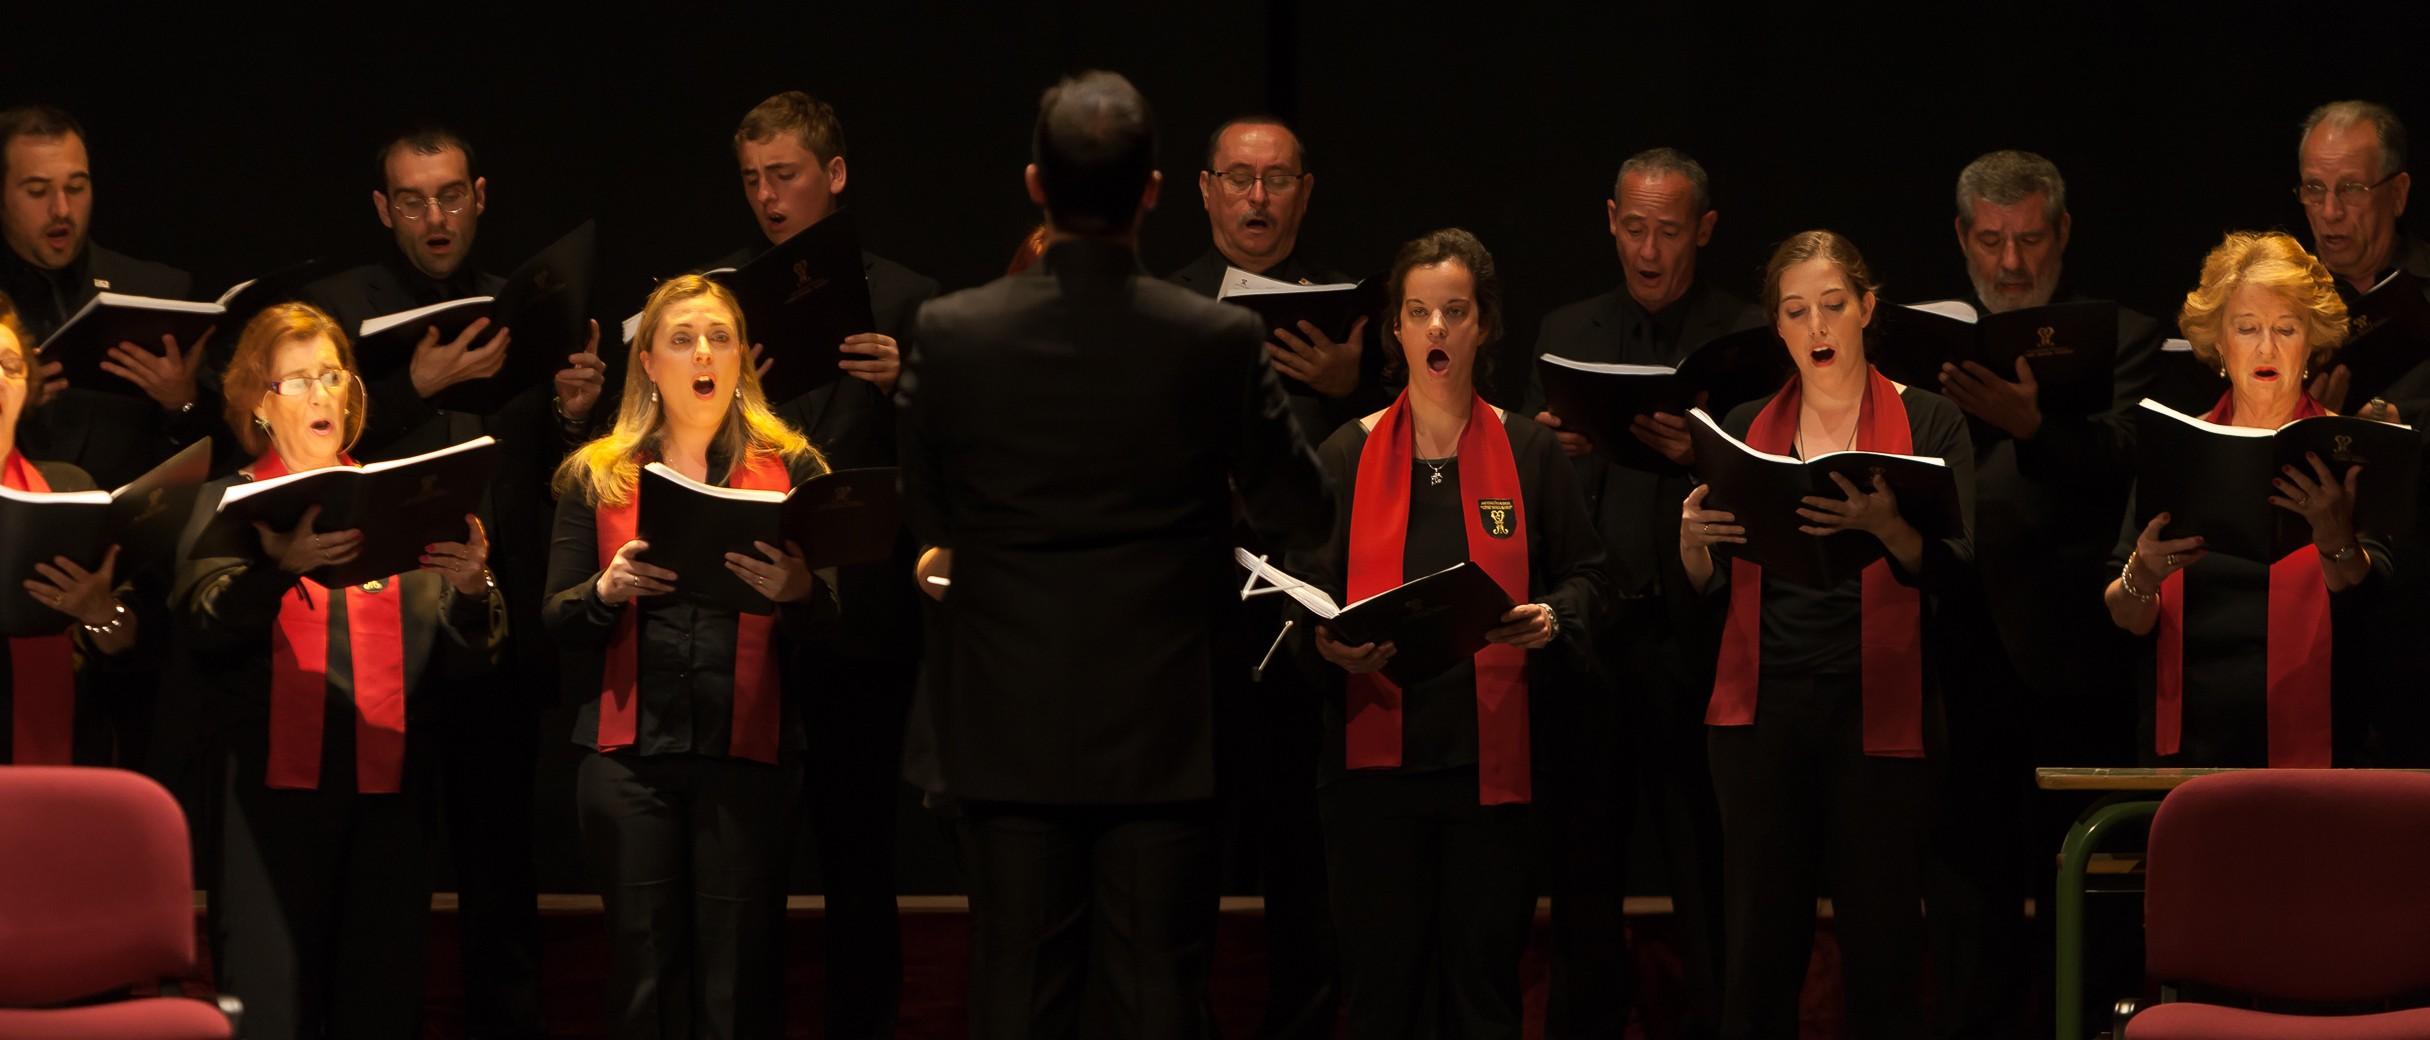 Concierto-Pastora-Soler-5-e1406634295386